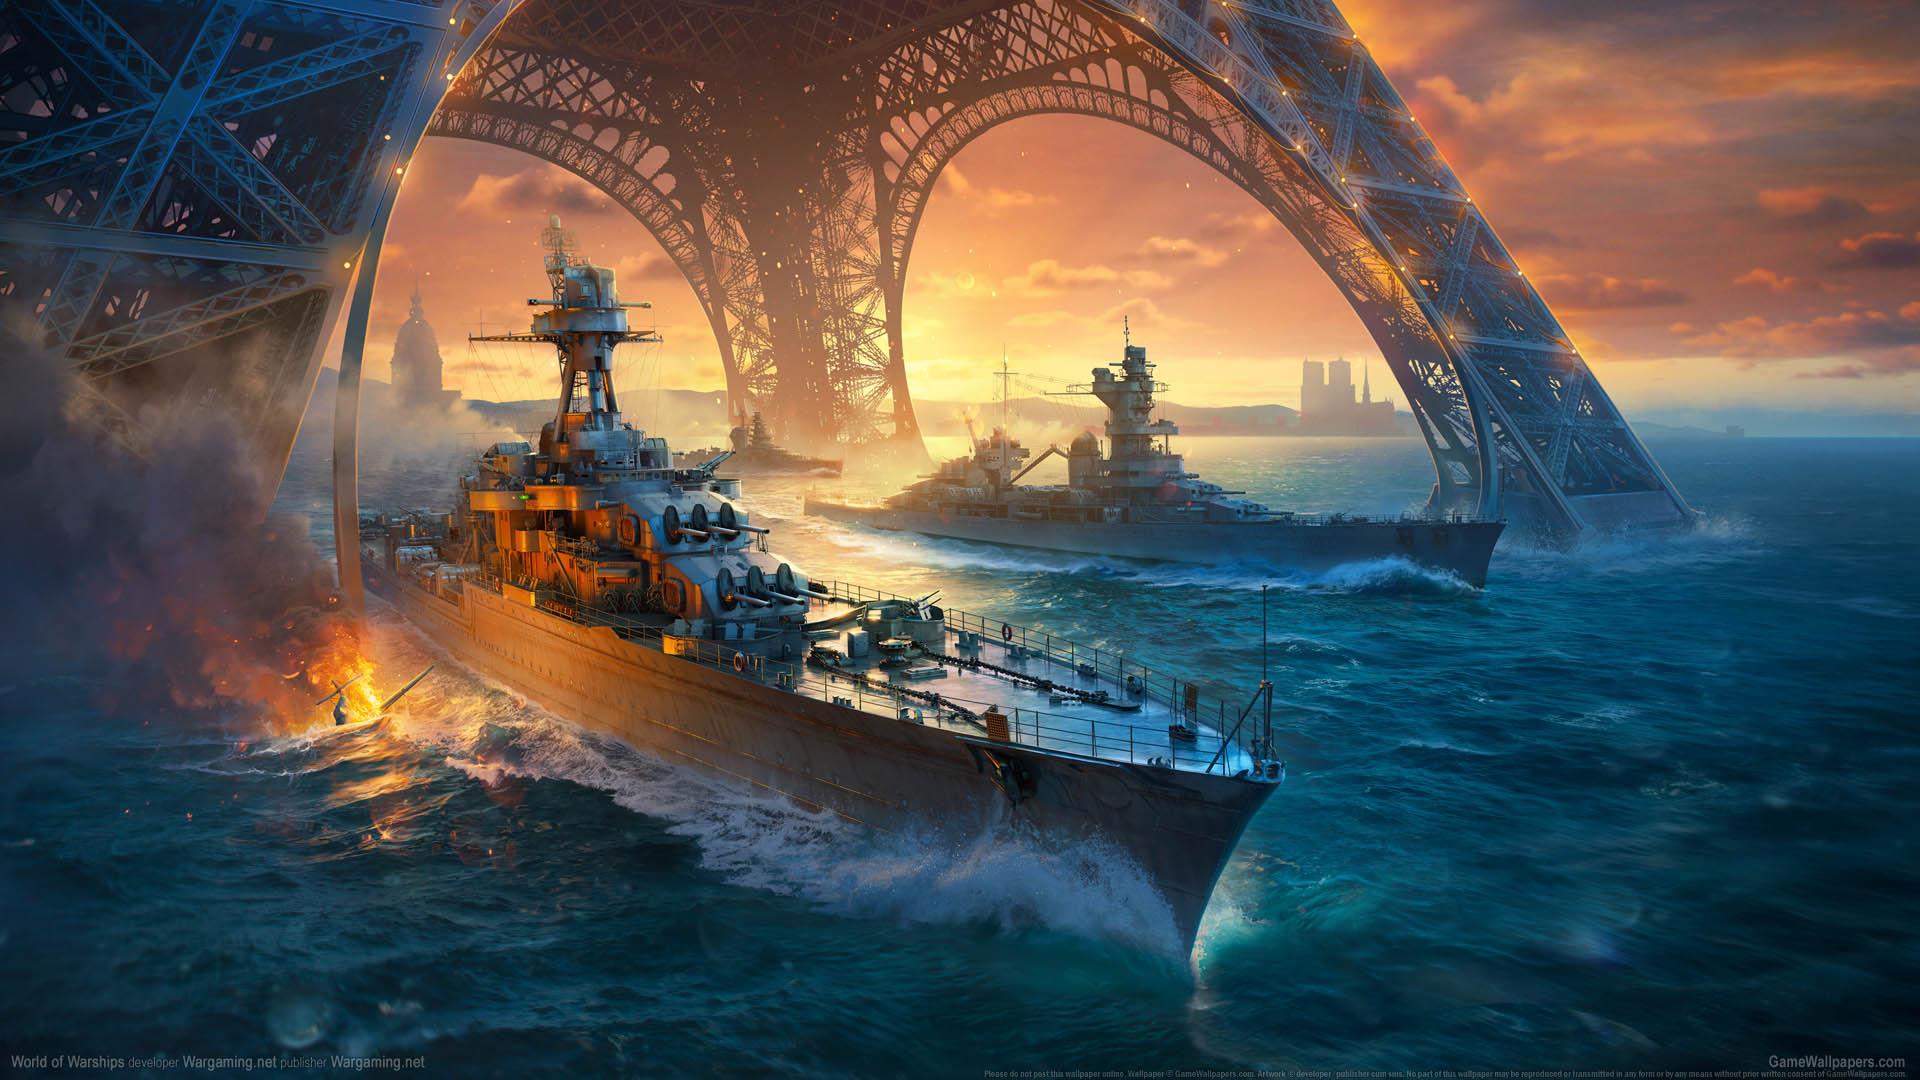 World of Warships wallpaper 20 1920x1080